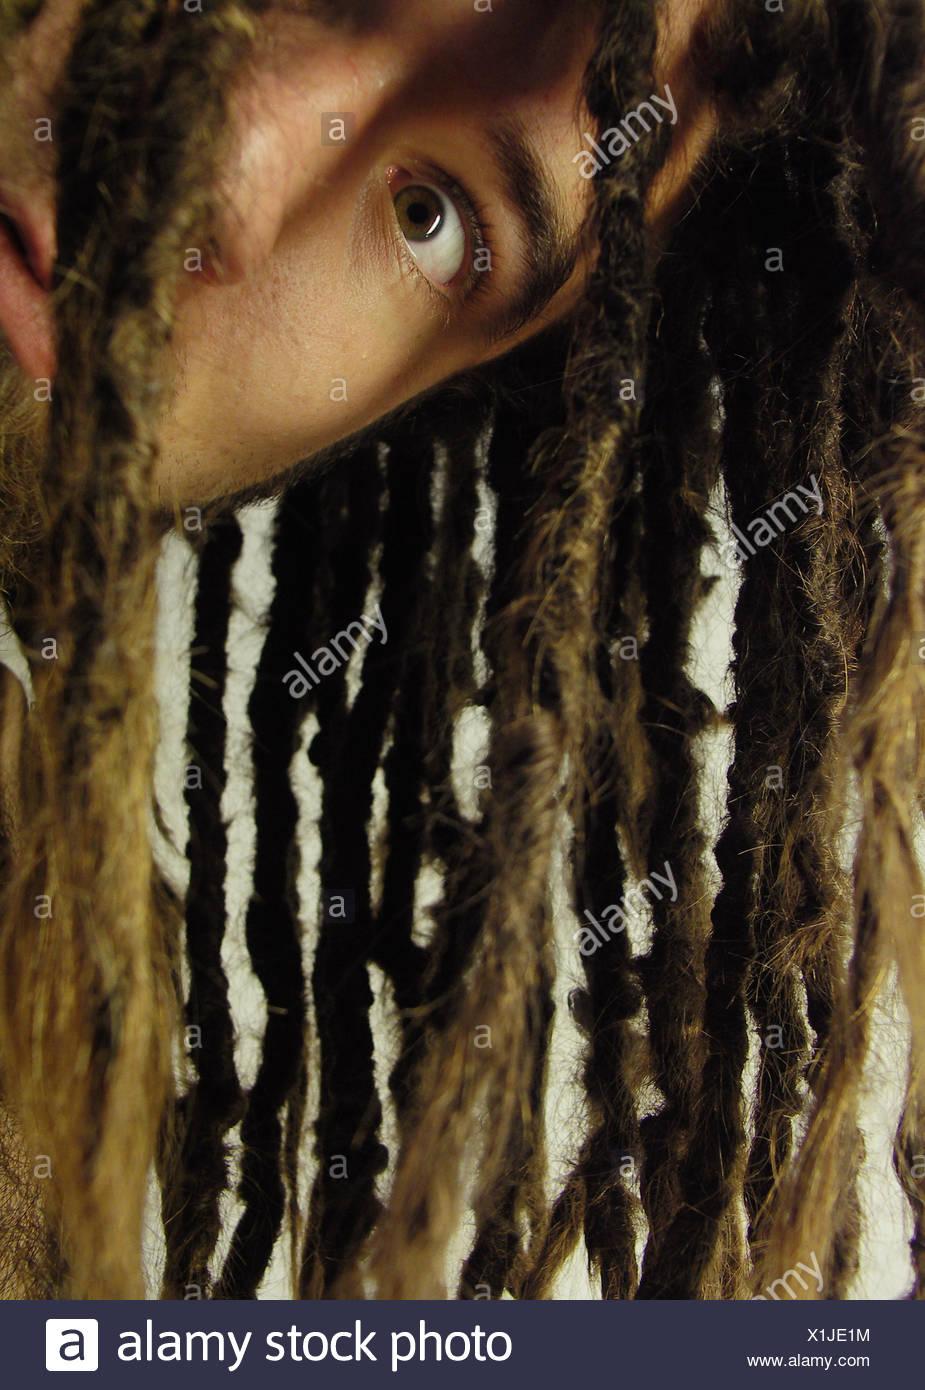 young man,hair,dreadlocks - Stock Image